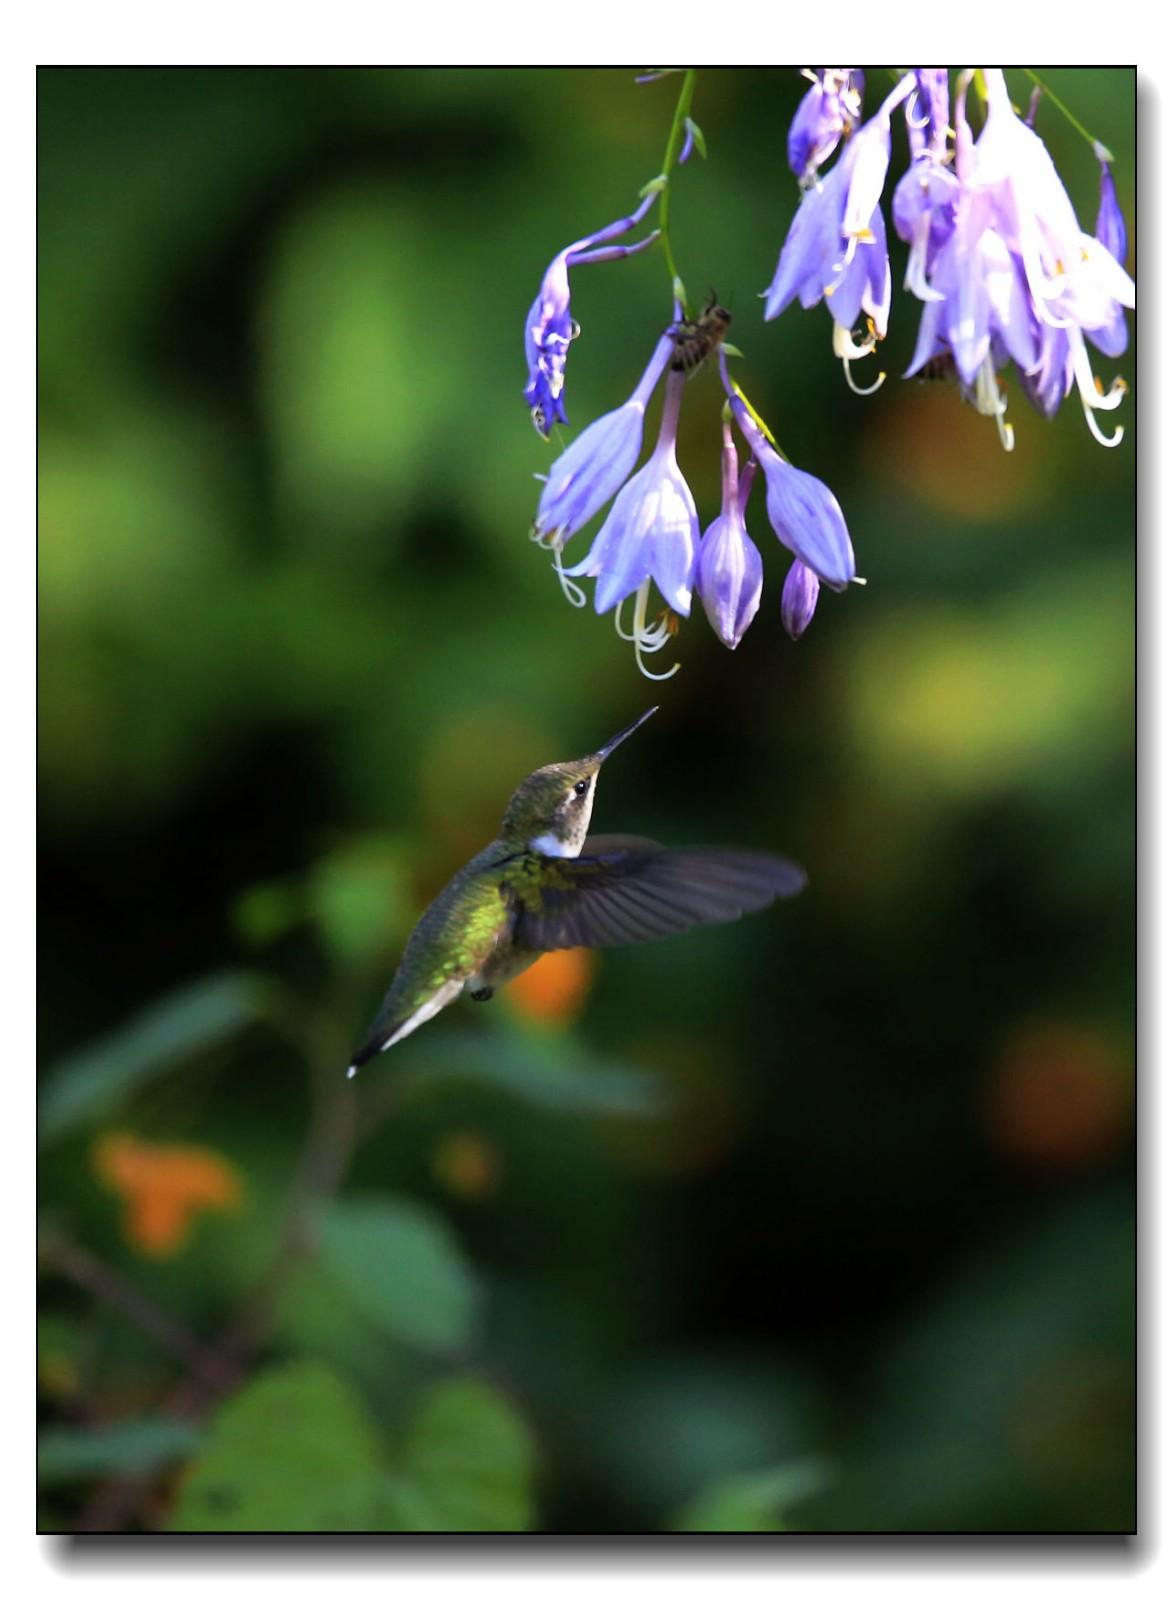 蜂鸟组图(六)_图1-5